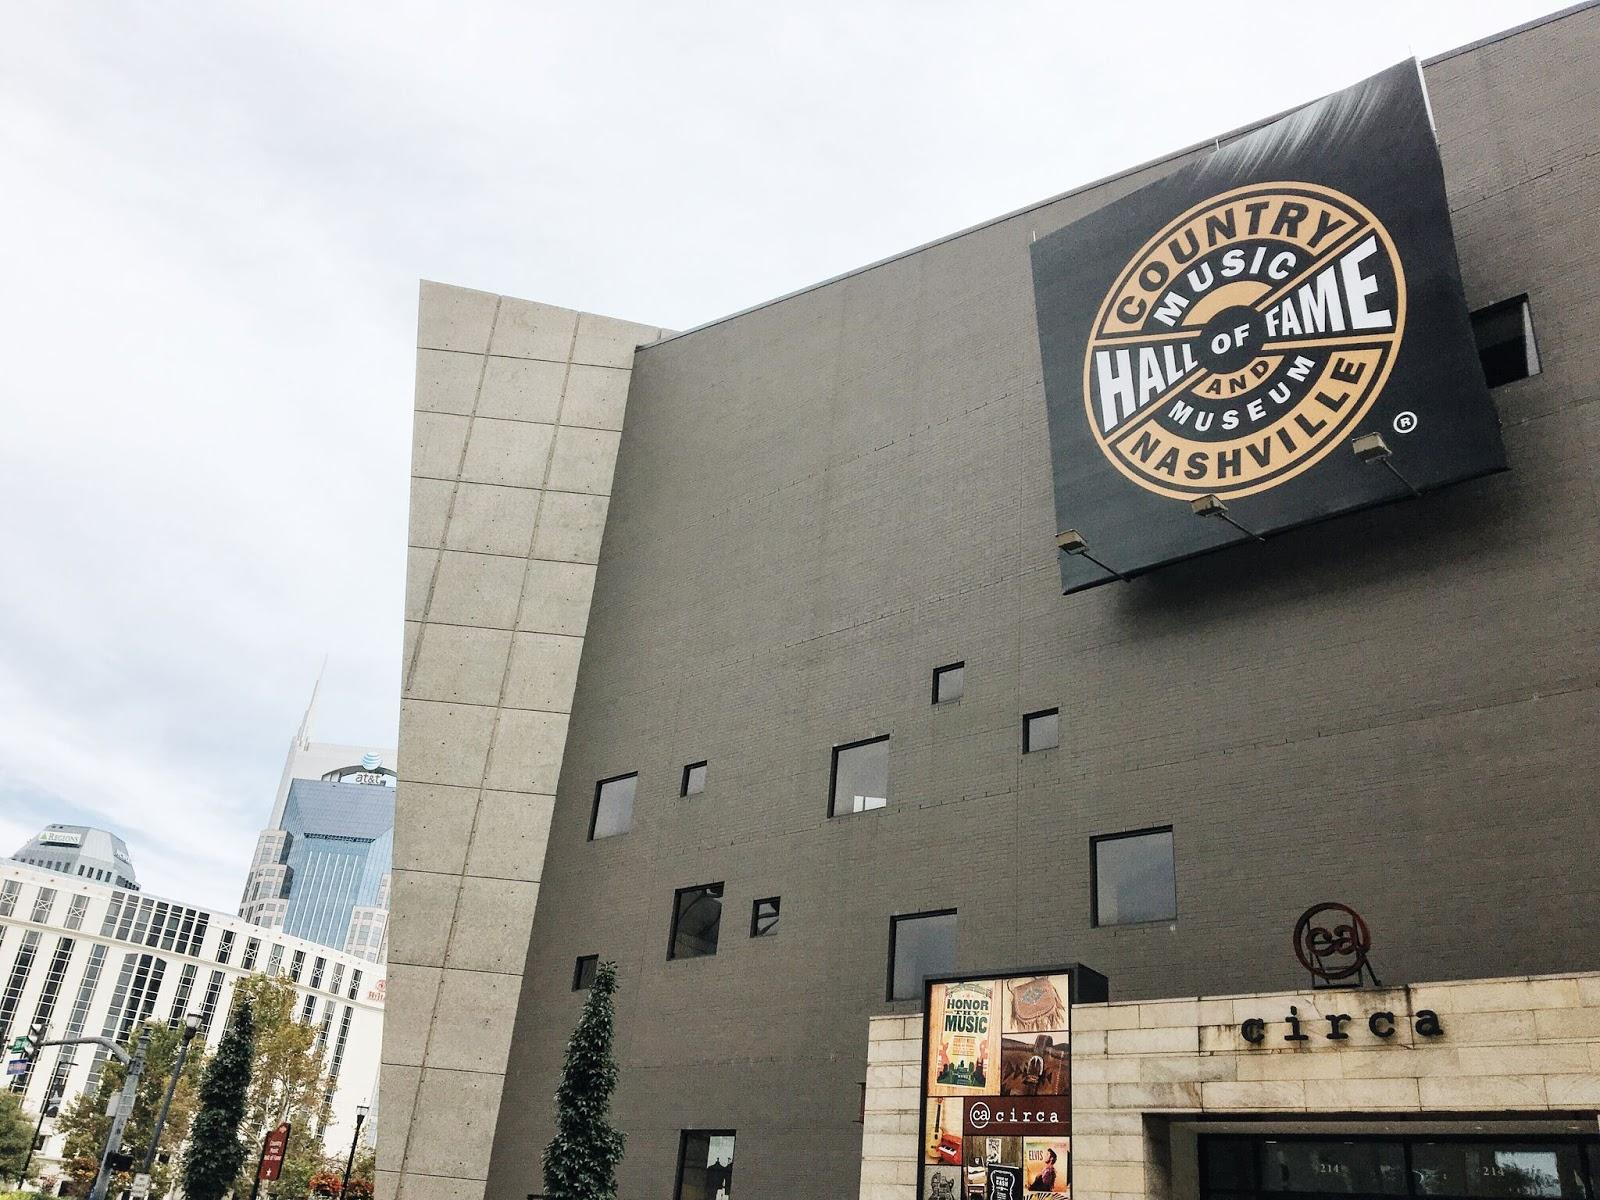 Counts-Music-Hall-of-Fame-Nashville